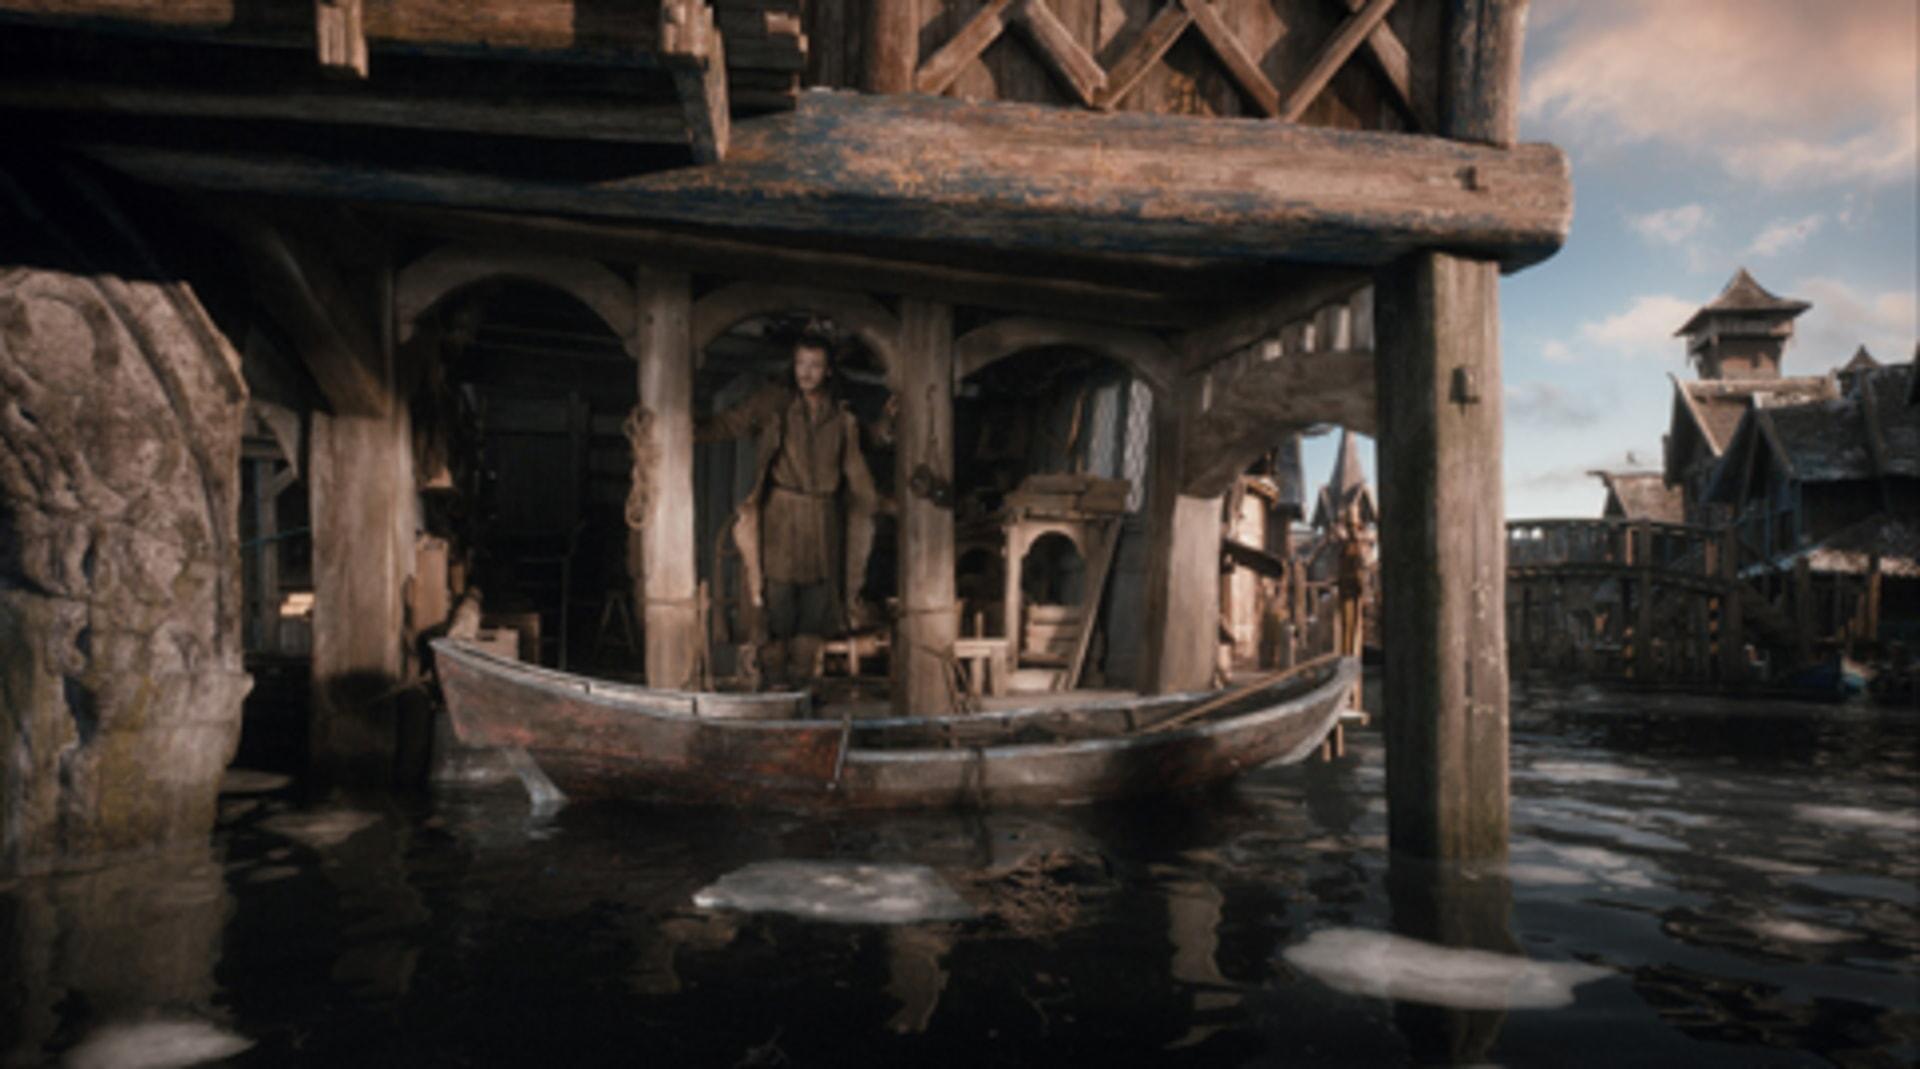 The Hobbit: The Desolation of Smaug - Image 15